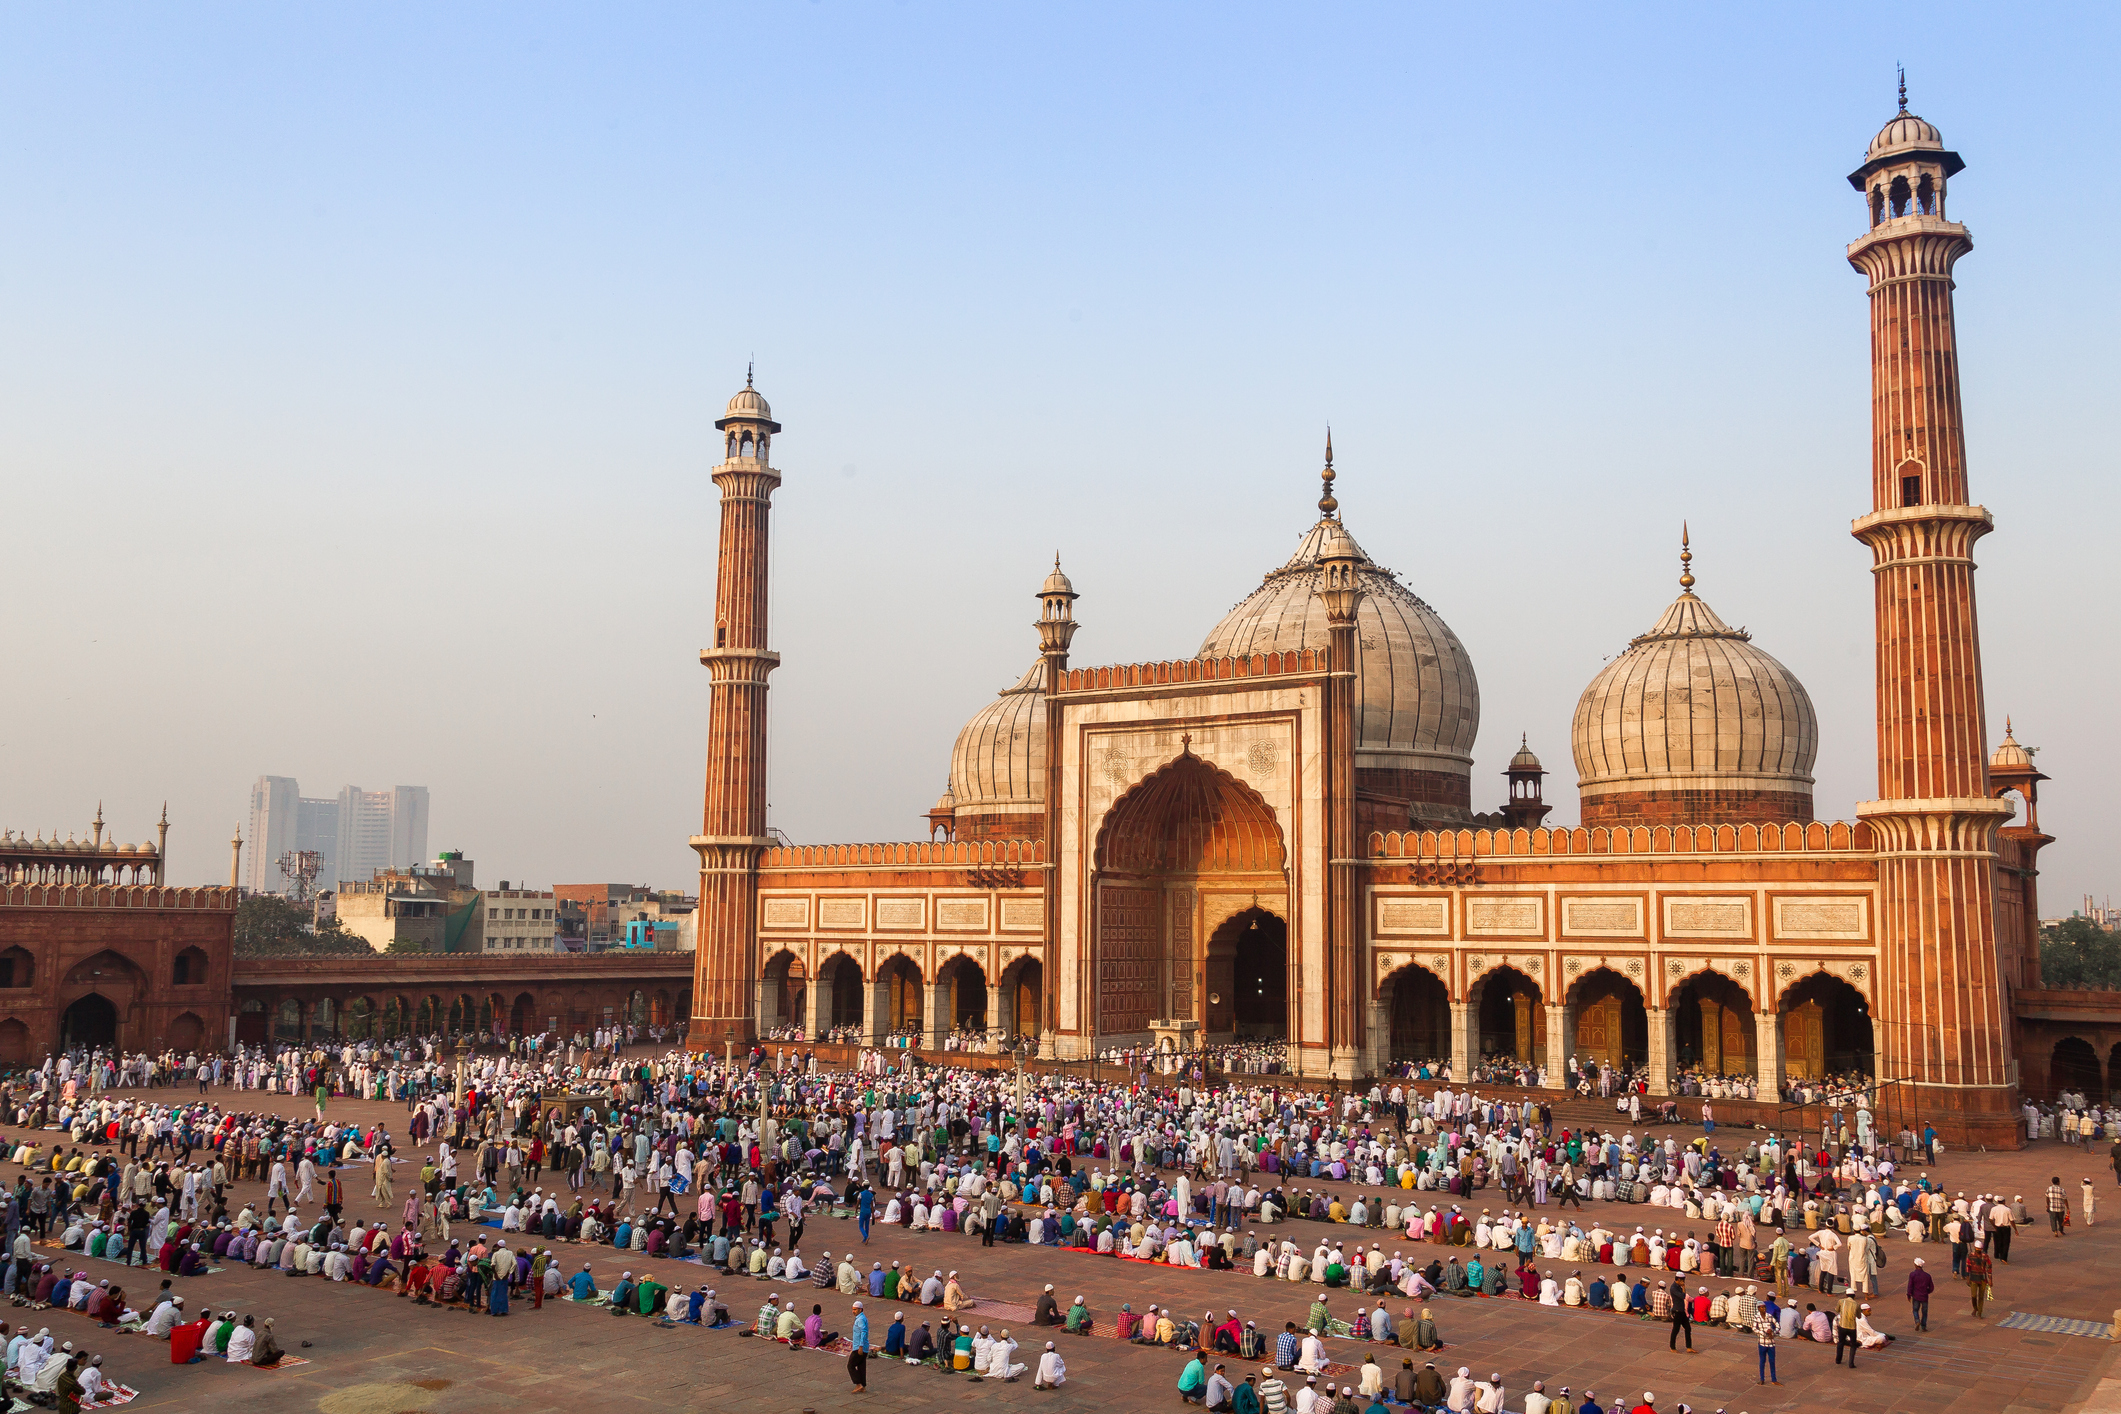 The Jama Masjid in Delhi